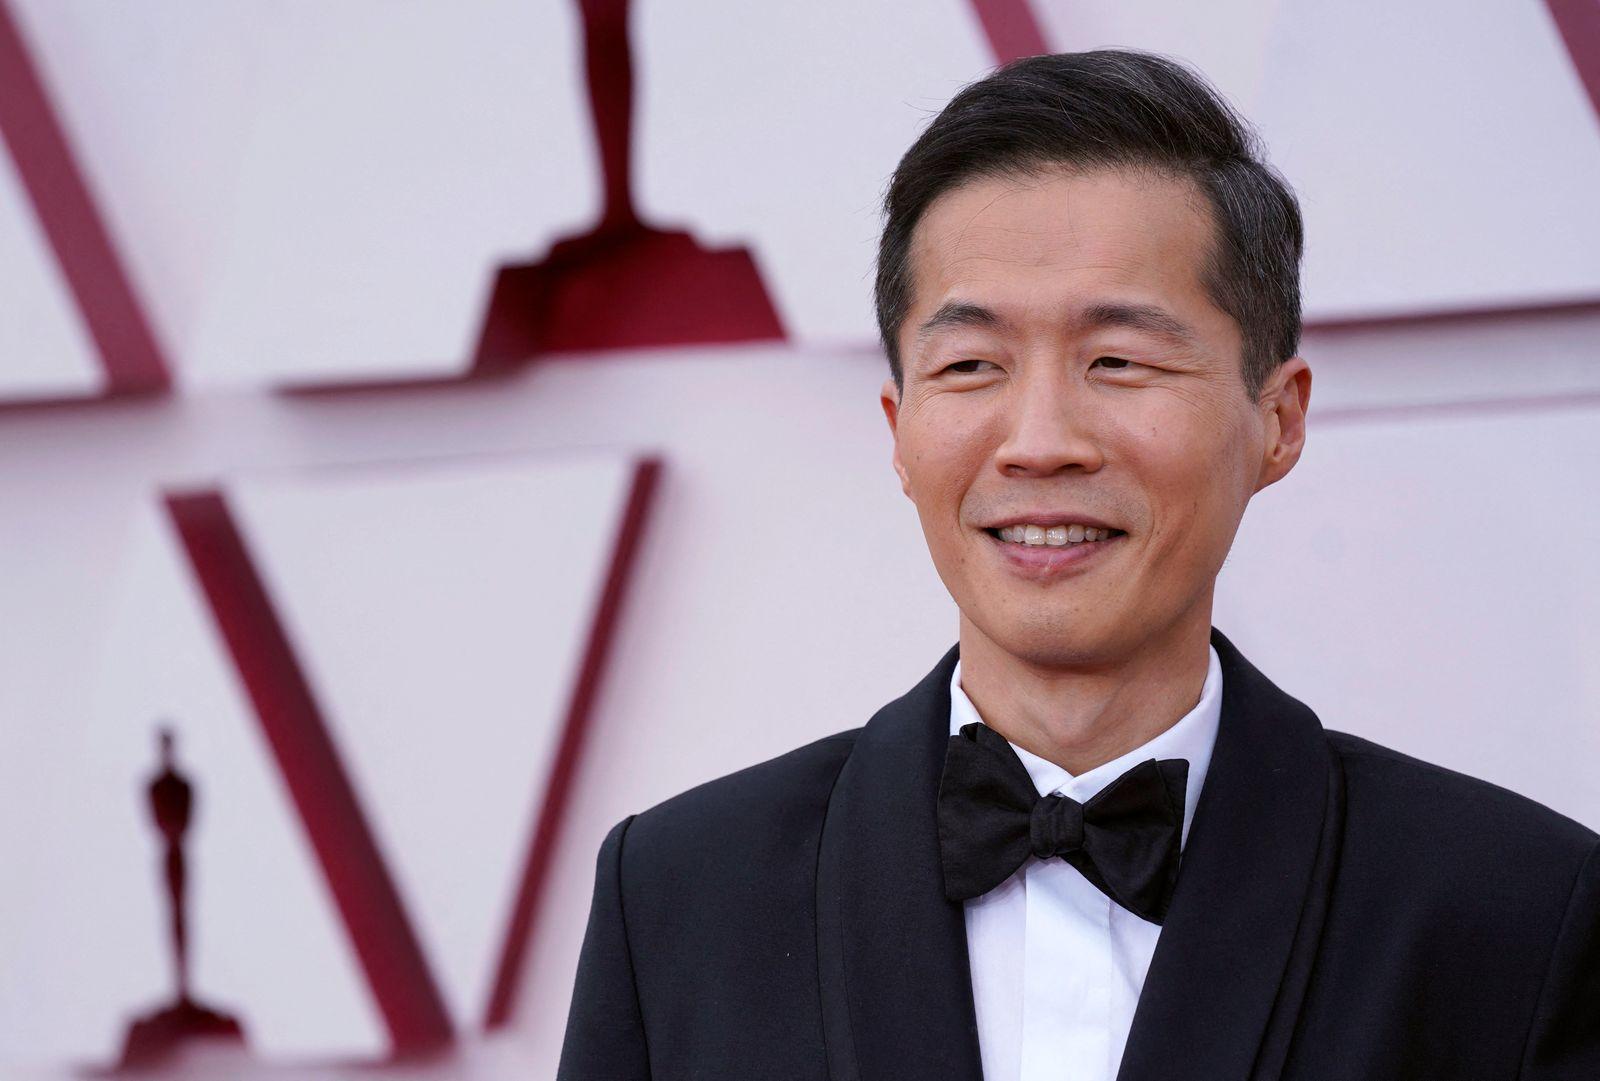 Oscars night, the 93rd Academy Awards ceremony